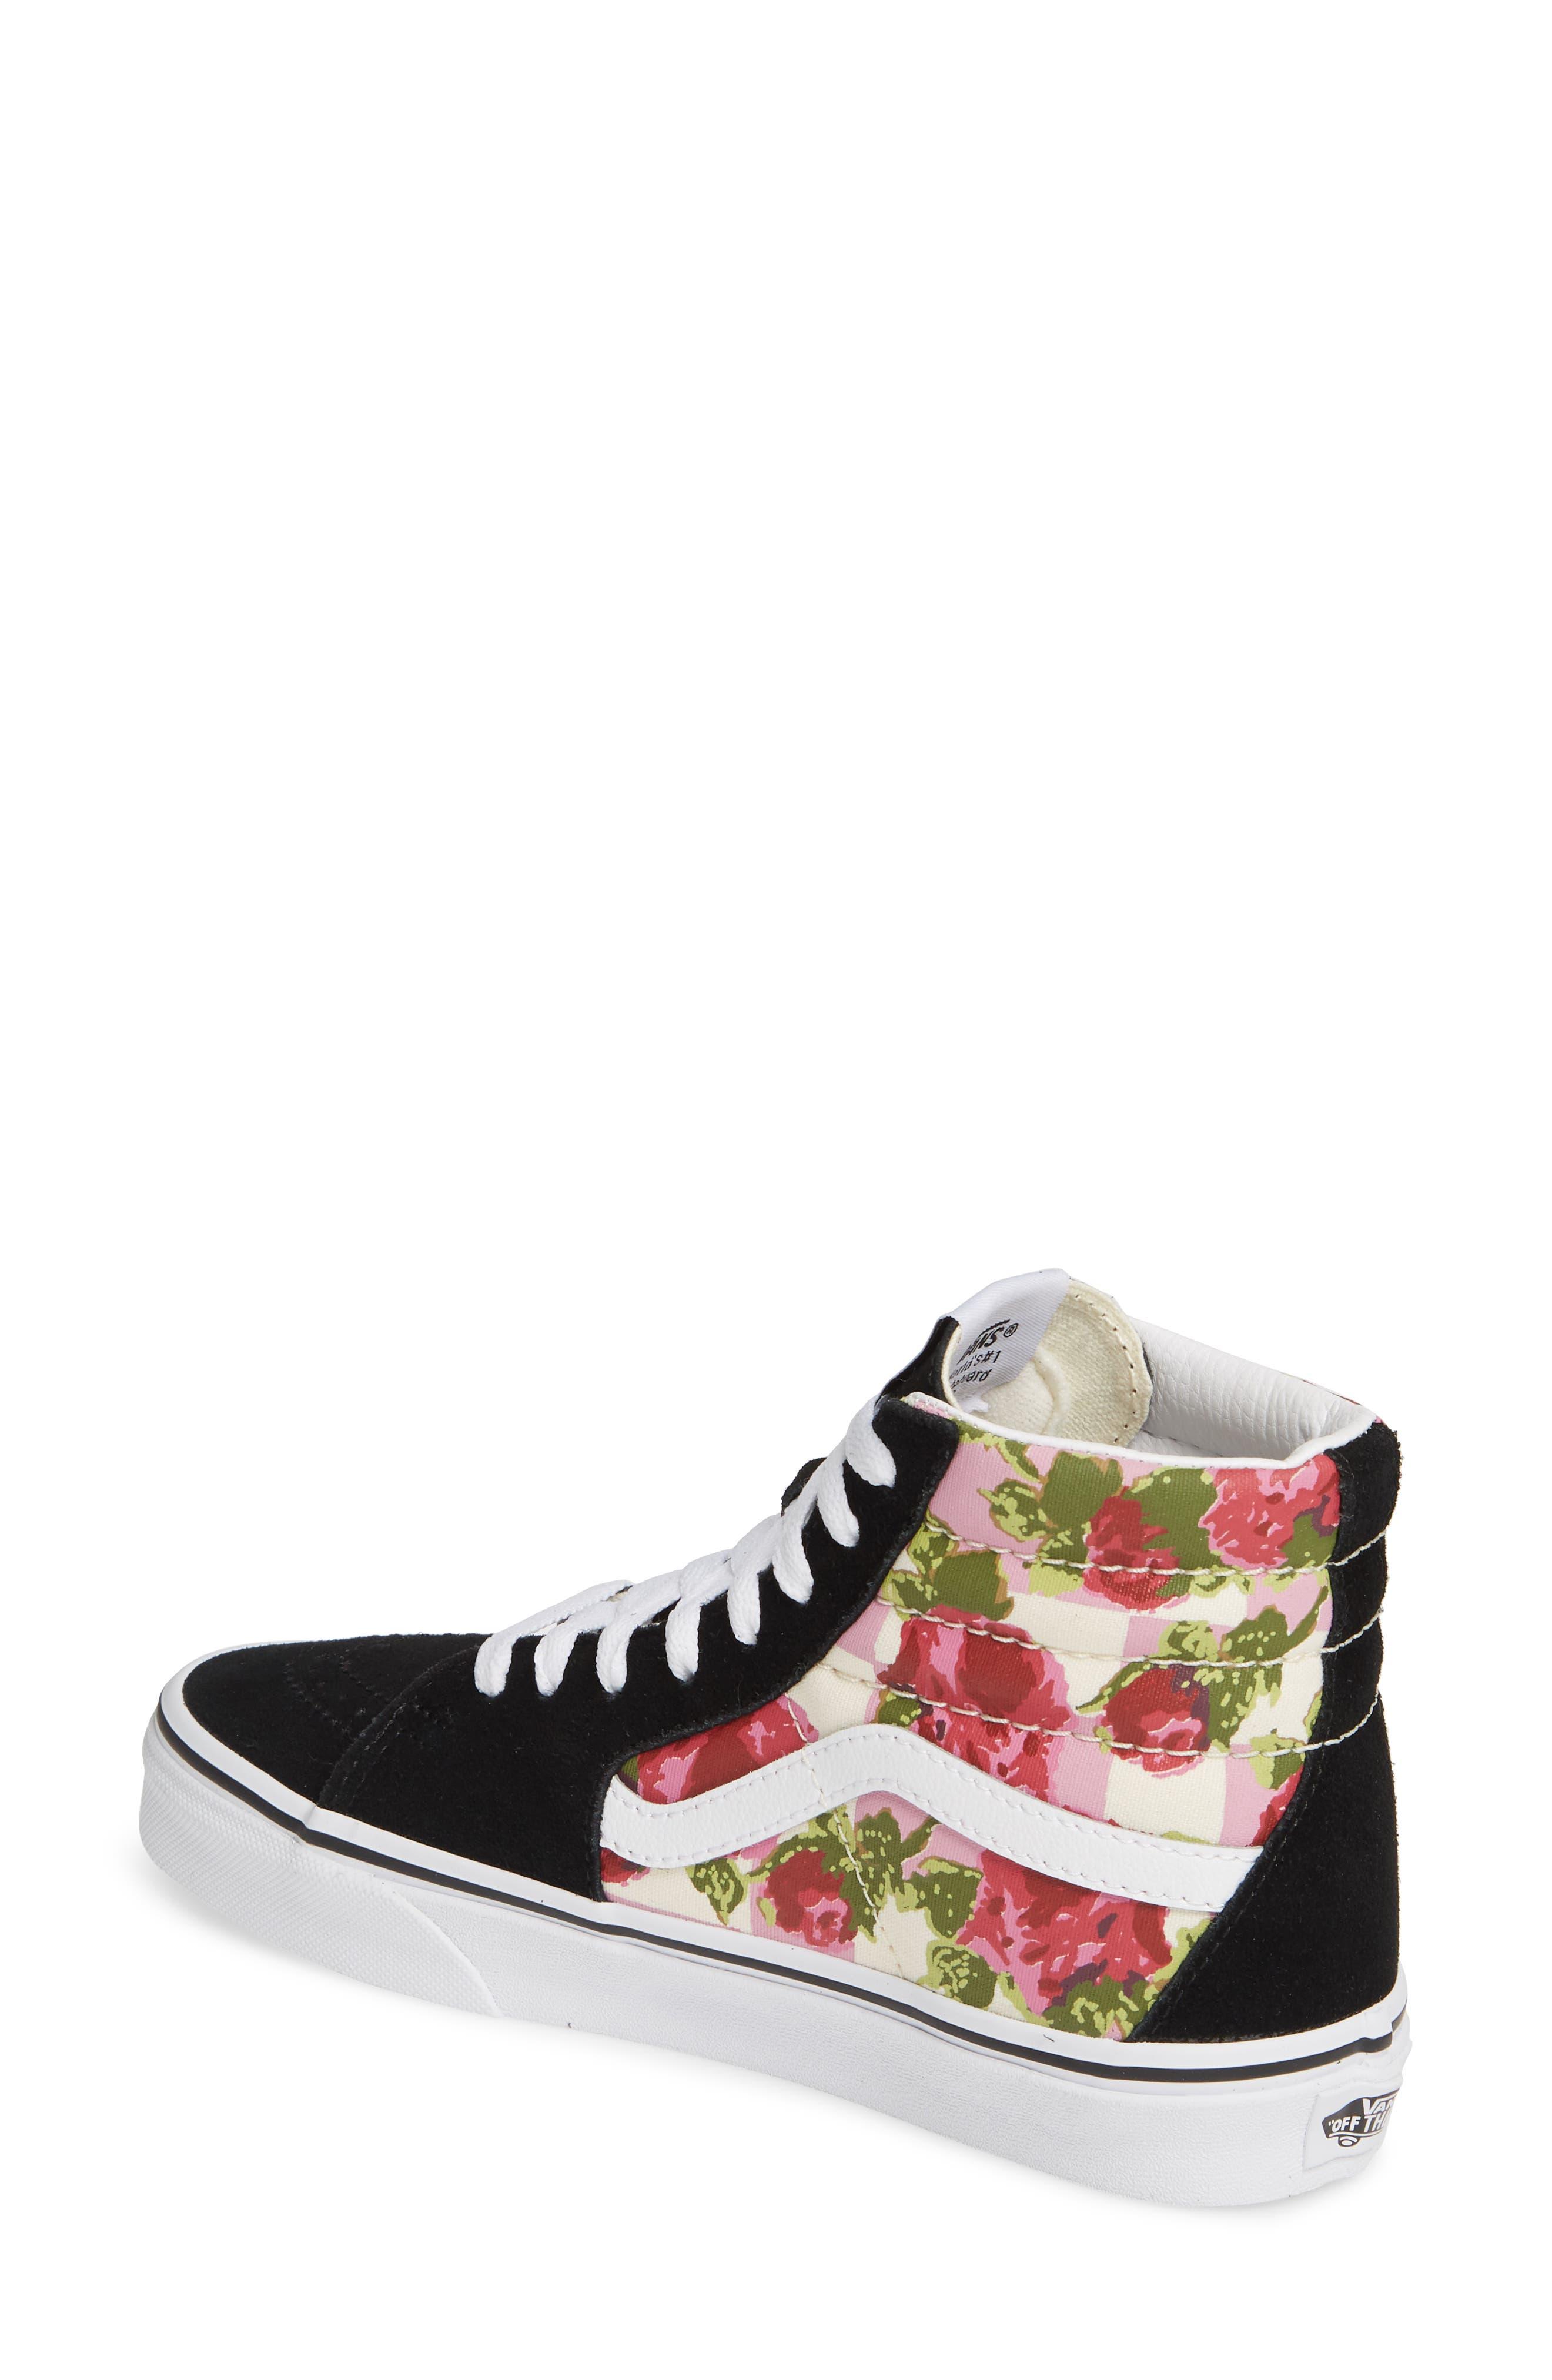 VANS, Sk8-Hi Floral Sneaker, Alternate thumbnail 2, color, FLORAL MULTI/ TRUE WHITE